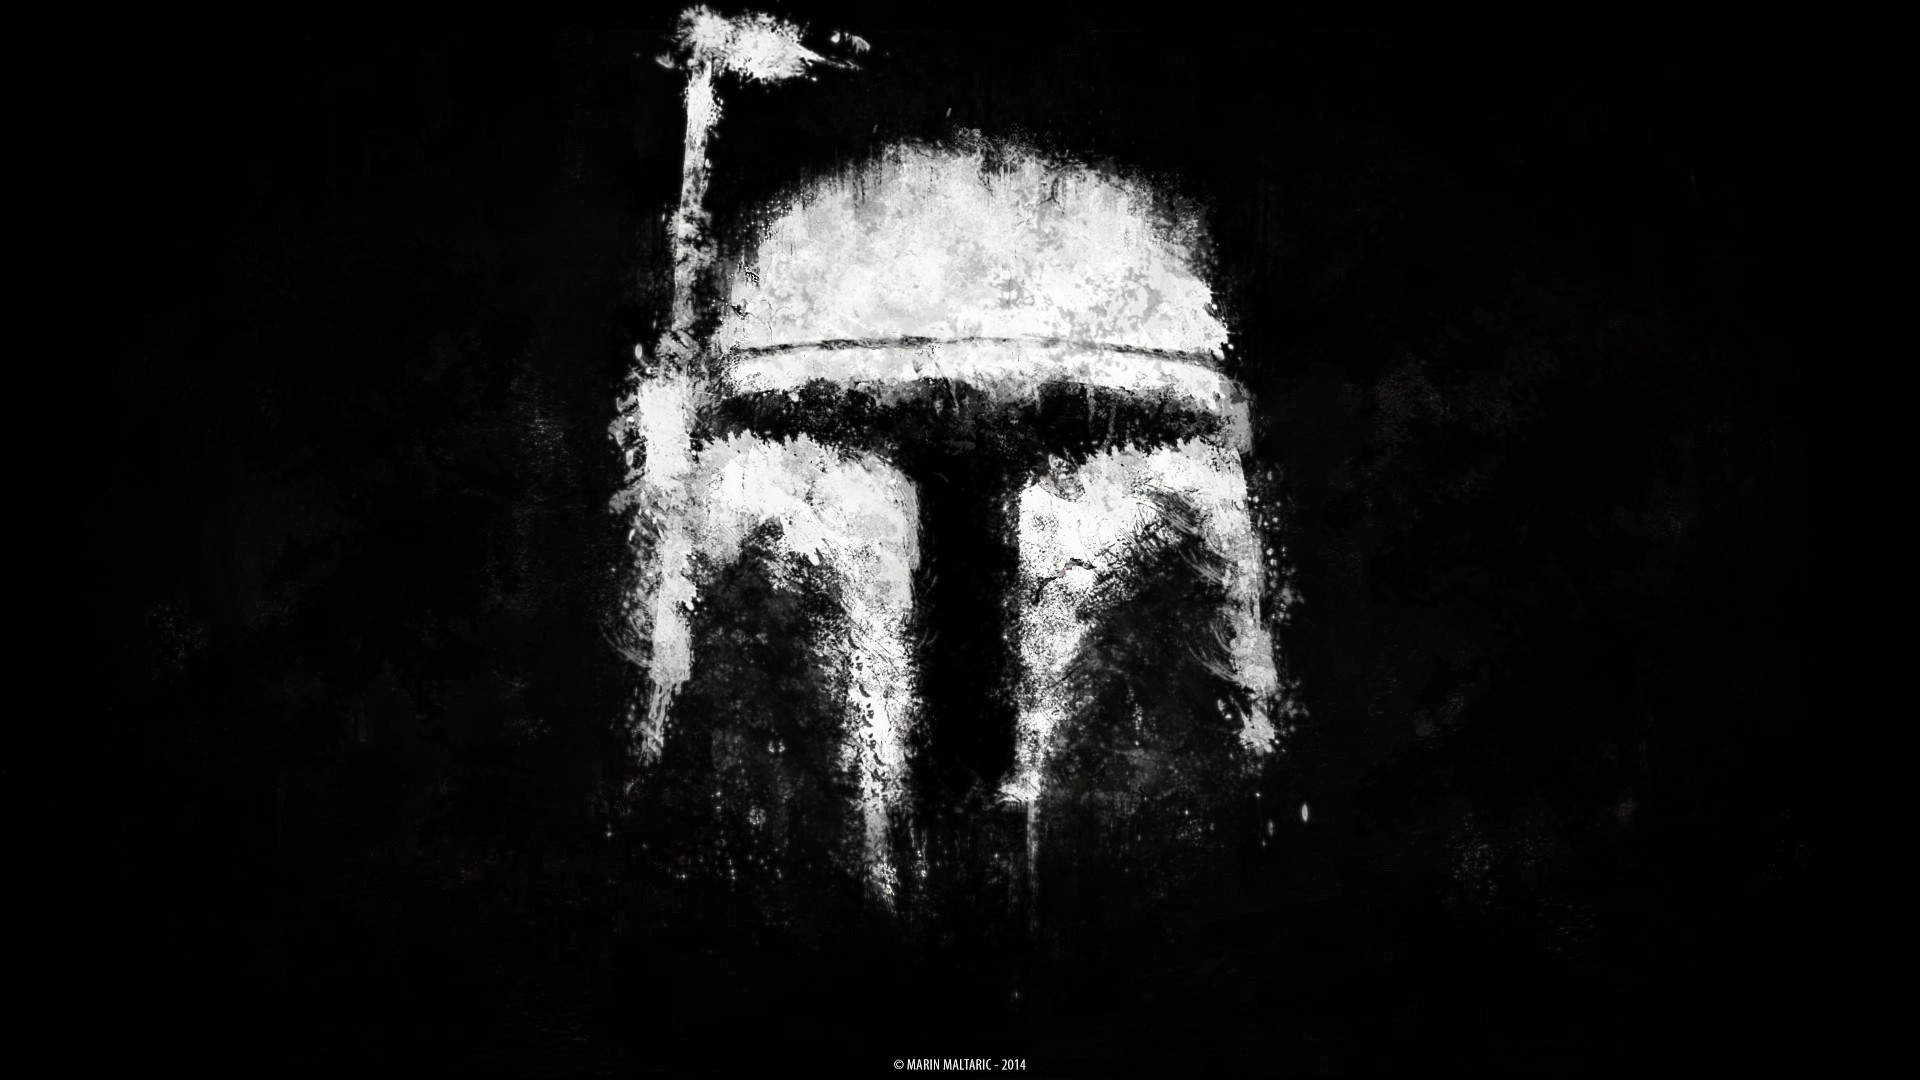 Download Mandalorian Wallpaper Hd Backgrounds Download